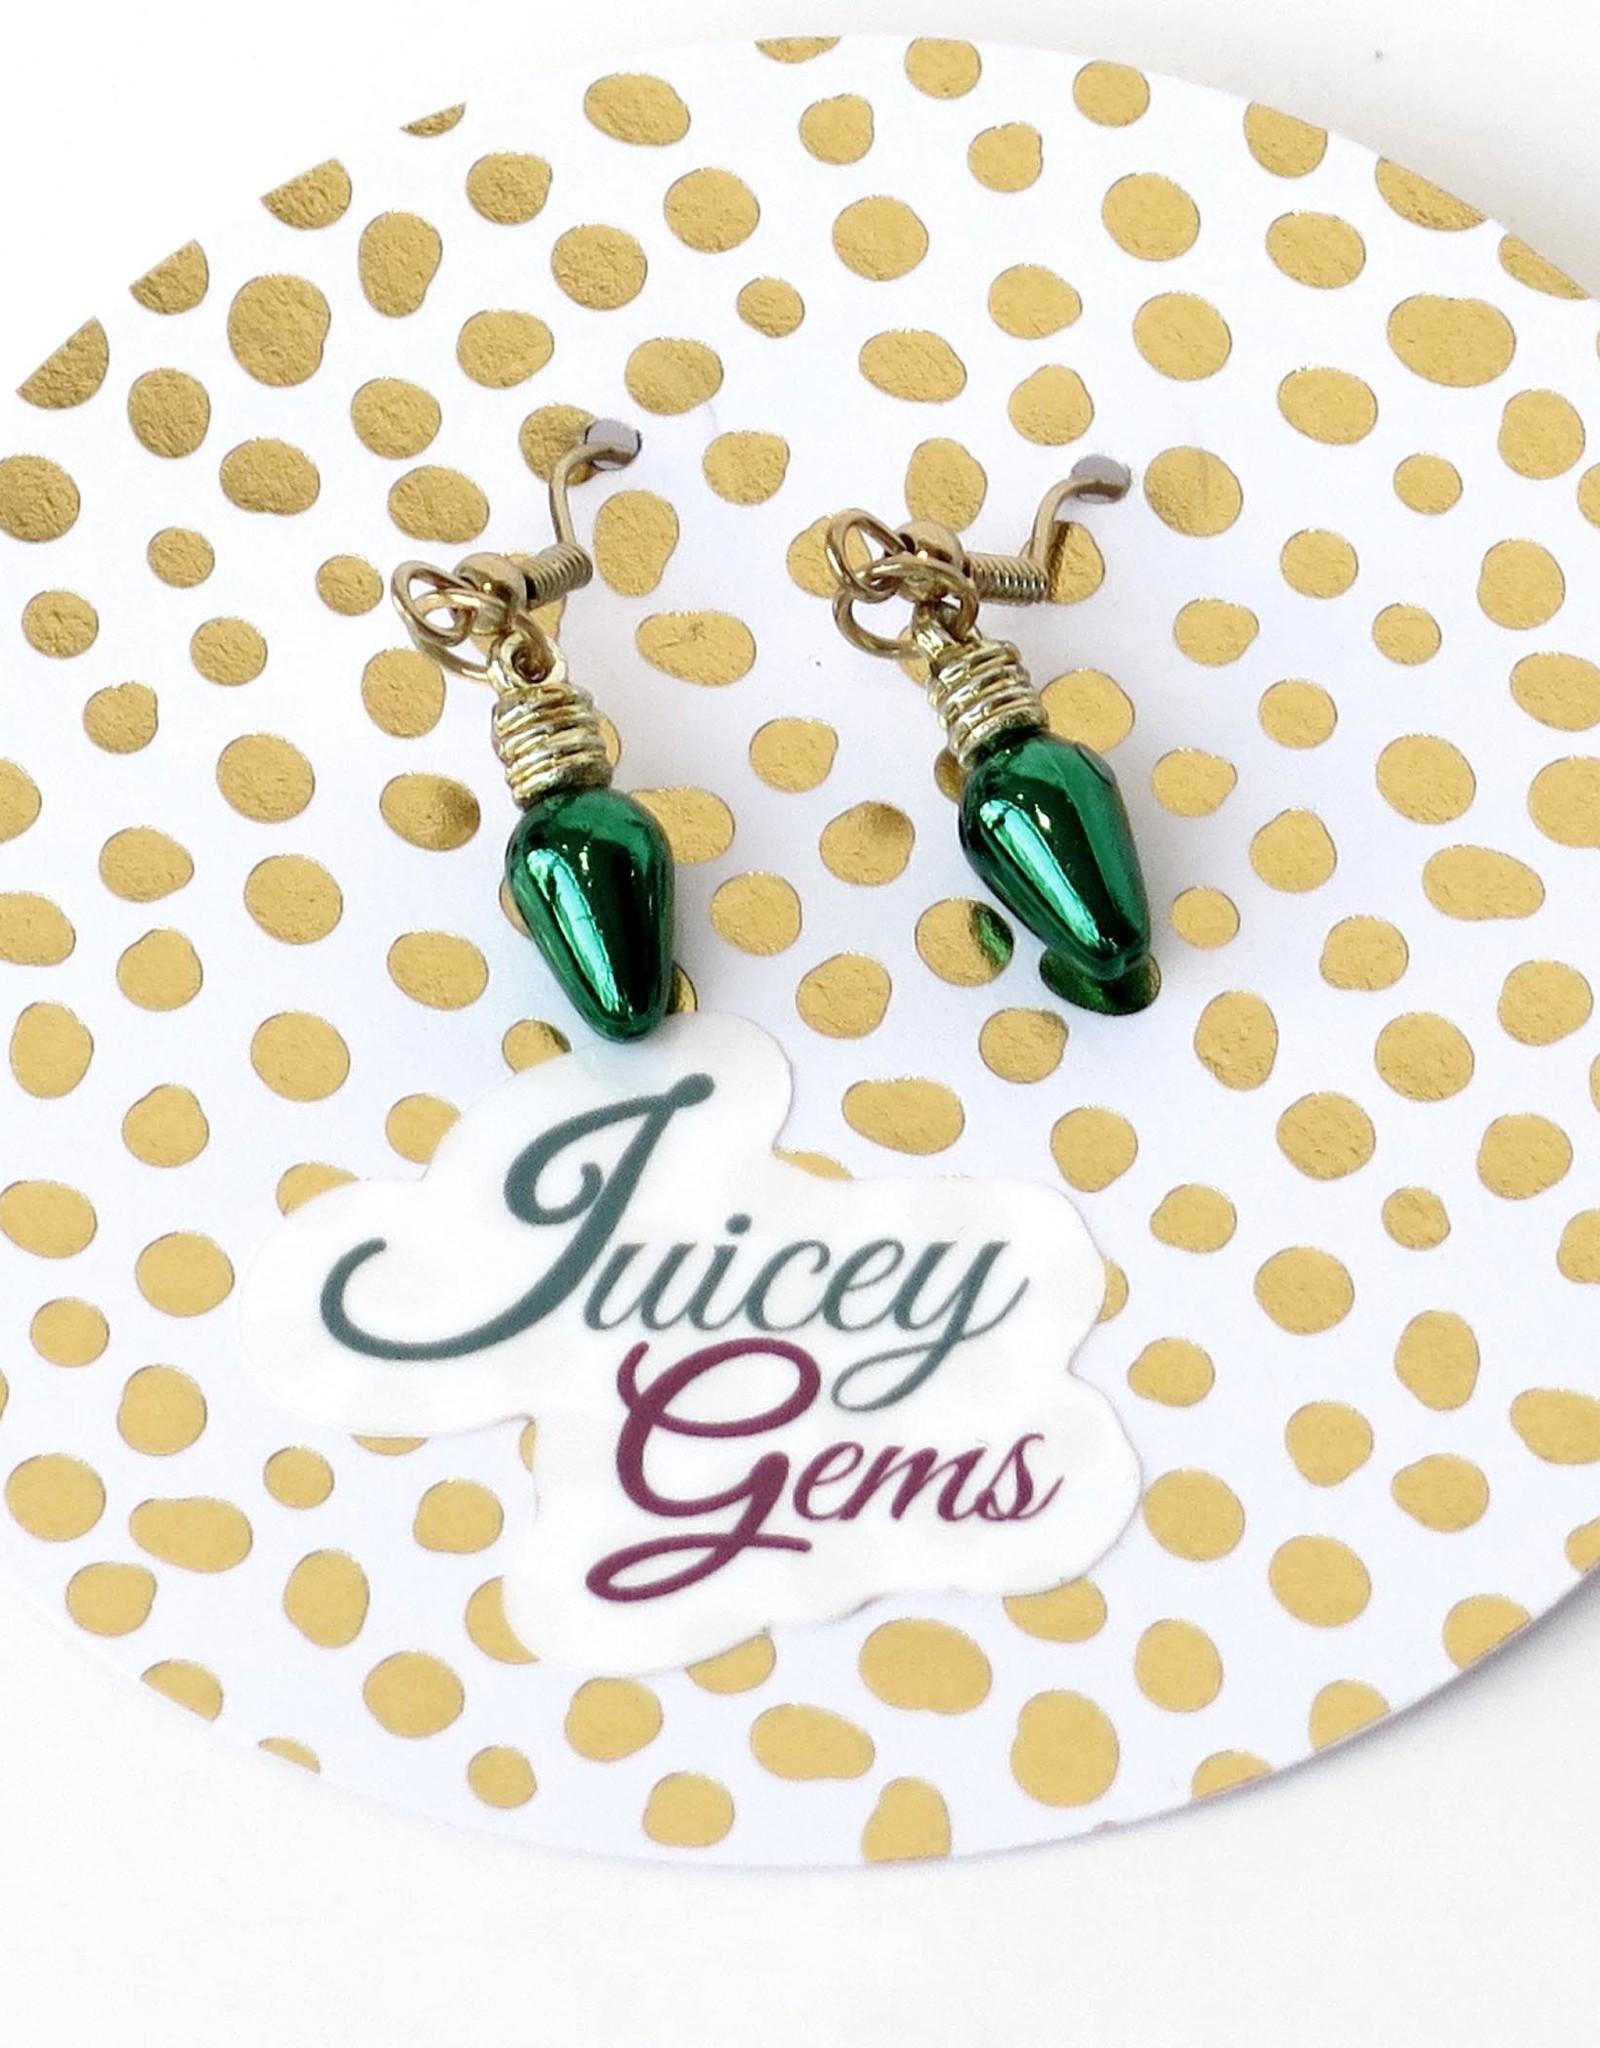 Juicey Gems Green Holiday Lights Earrings by Juicey Gems